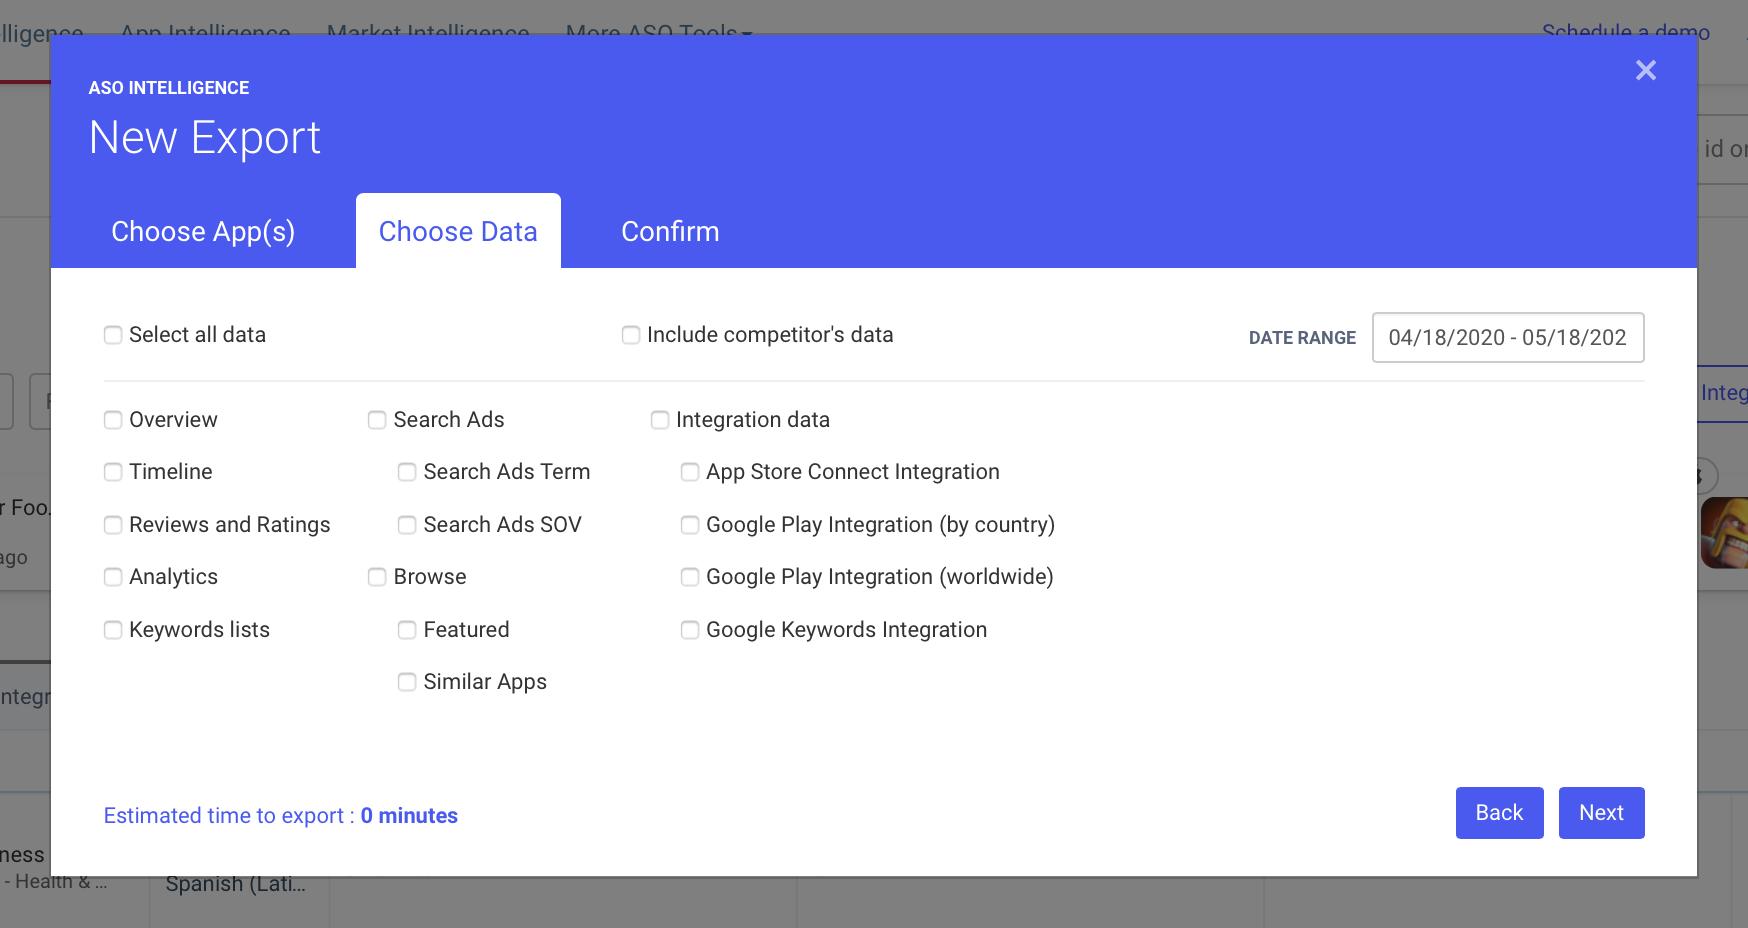 AppTweak ASO Tool: Export from dashboard pop-up choose data